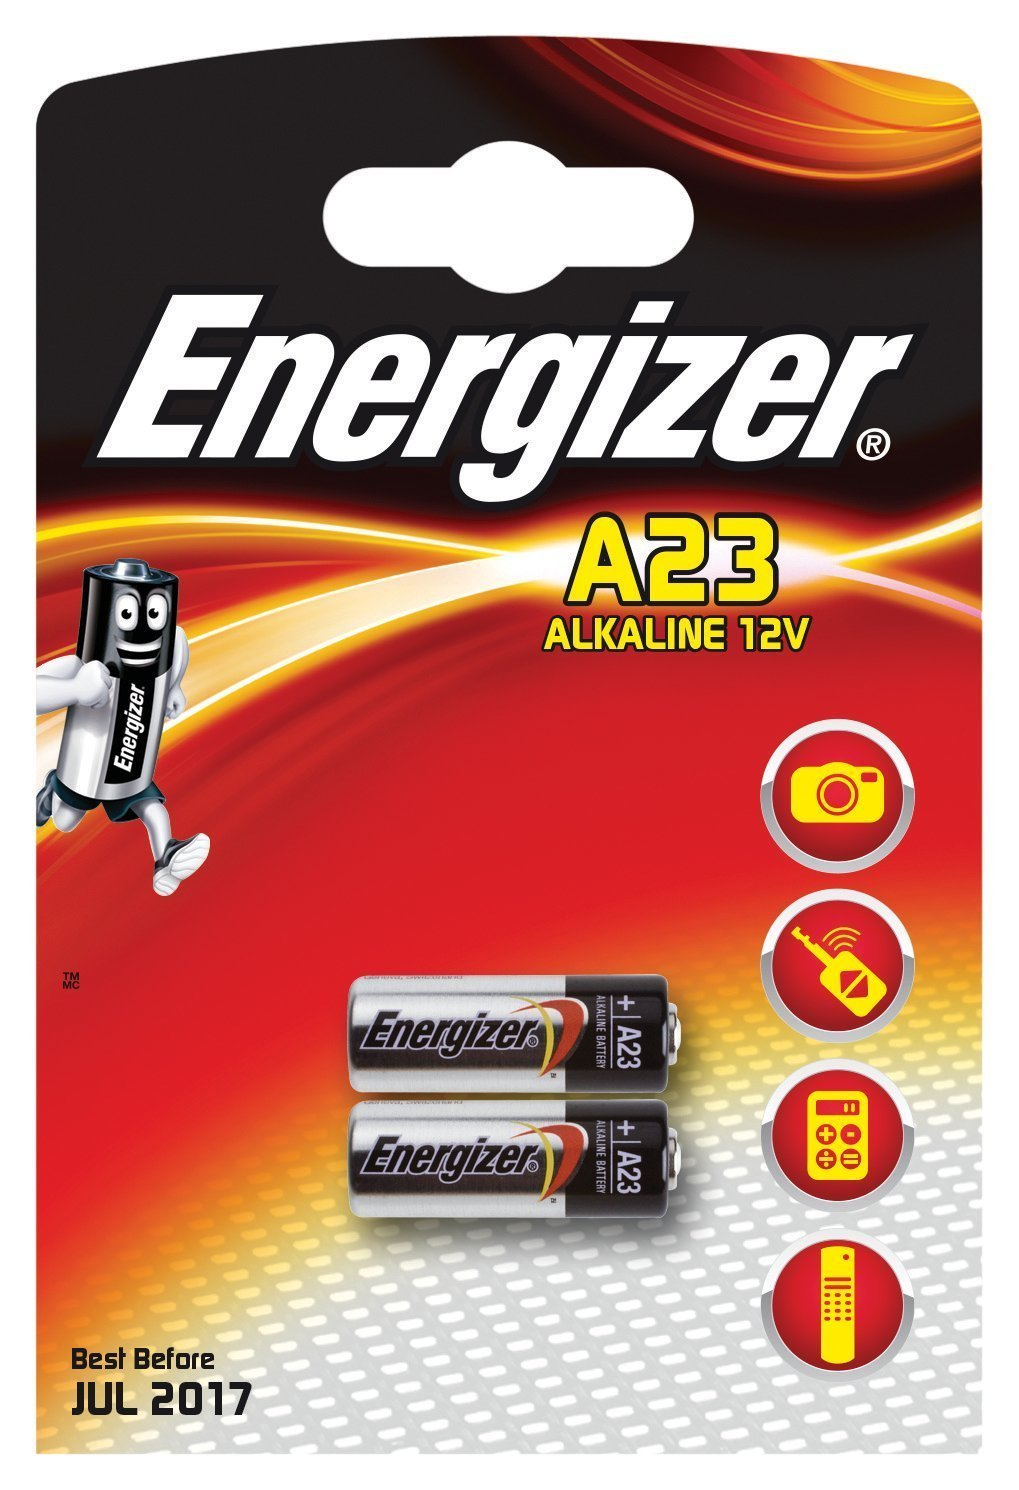 16 Count Energizer A23 Battery 12V